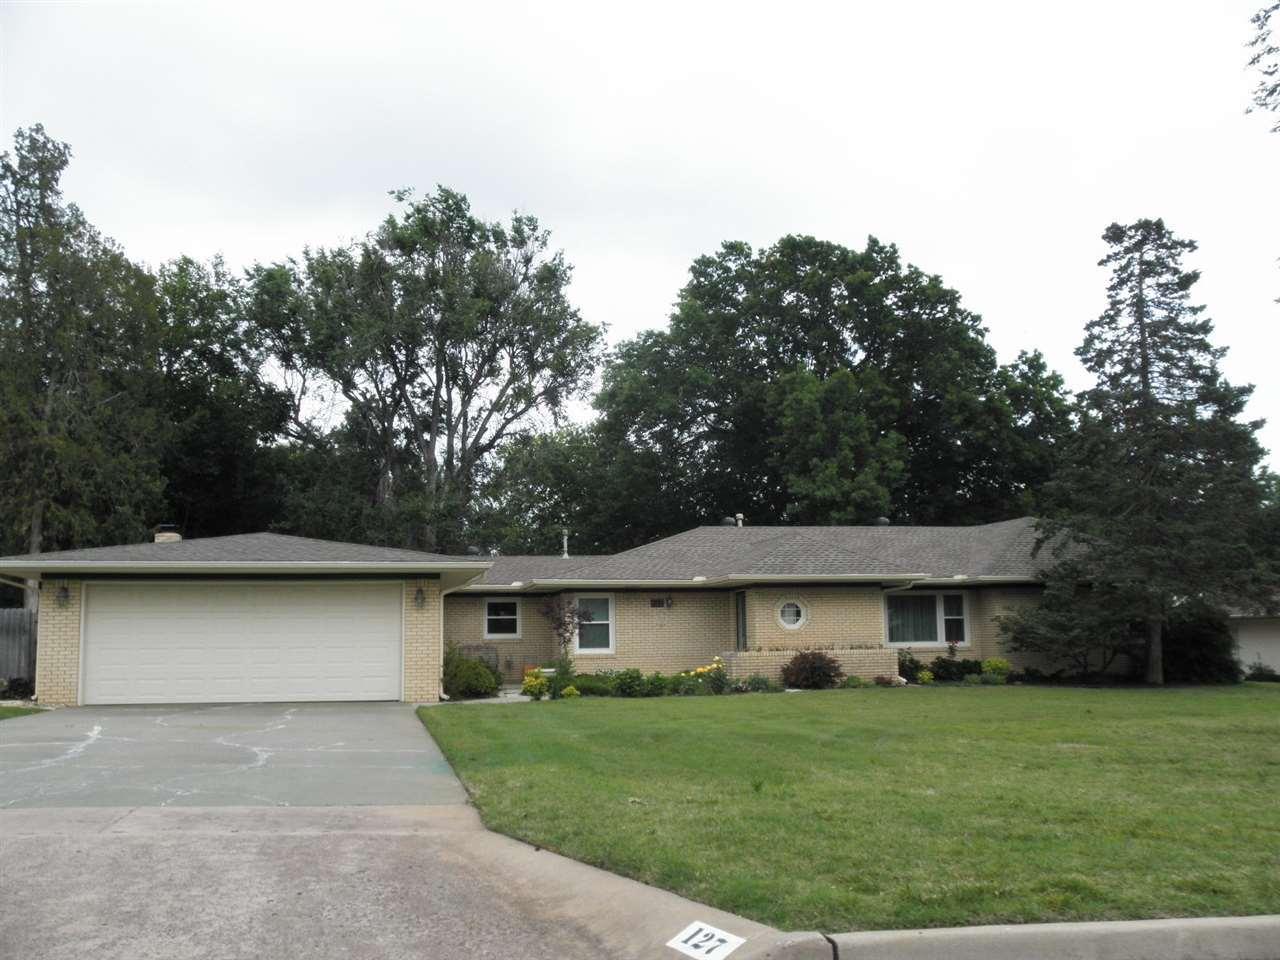 Sold Cross Sale W/ MLS | 127 Fairview  Ponca City, OK 74601 0